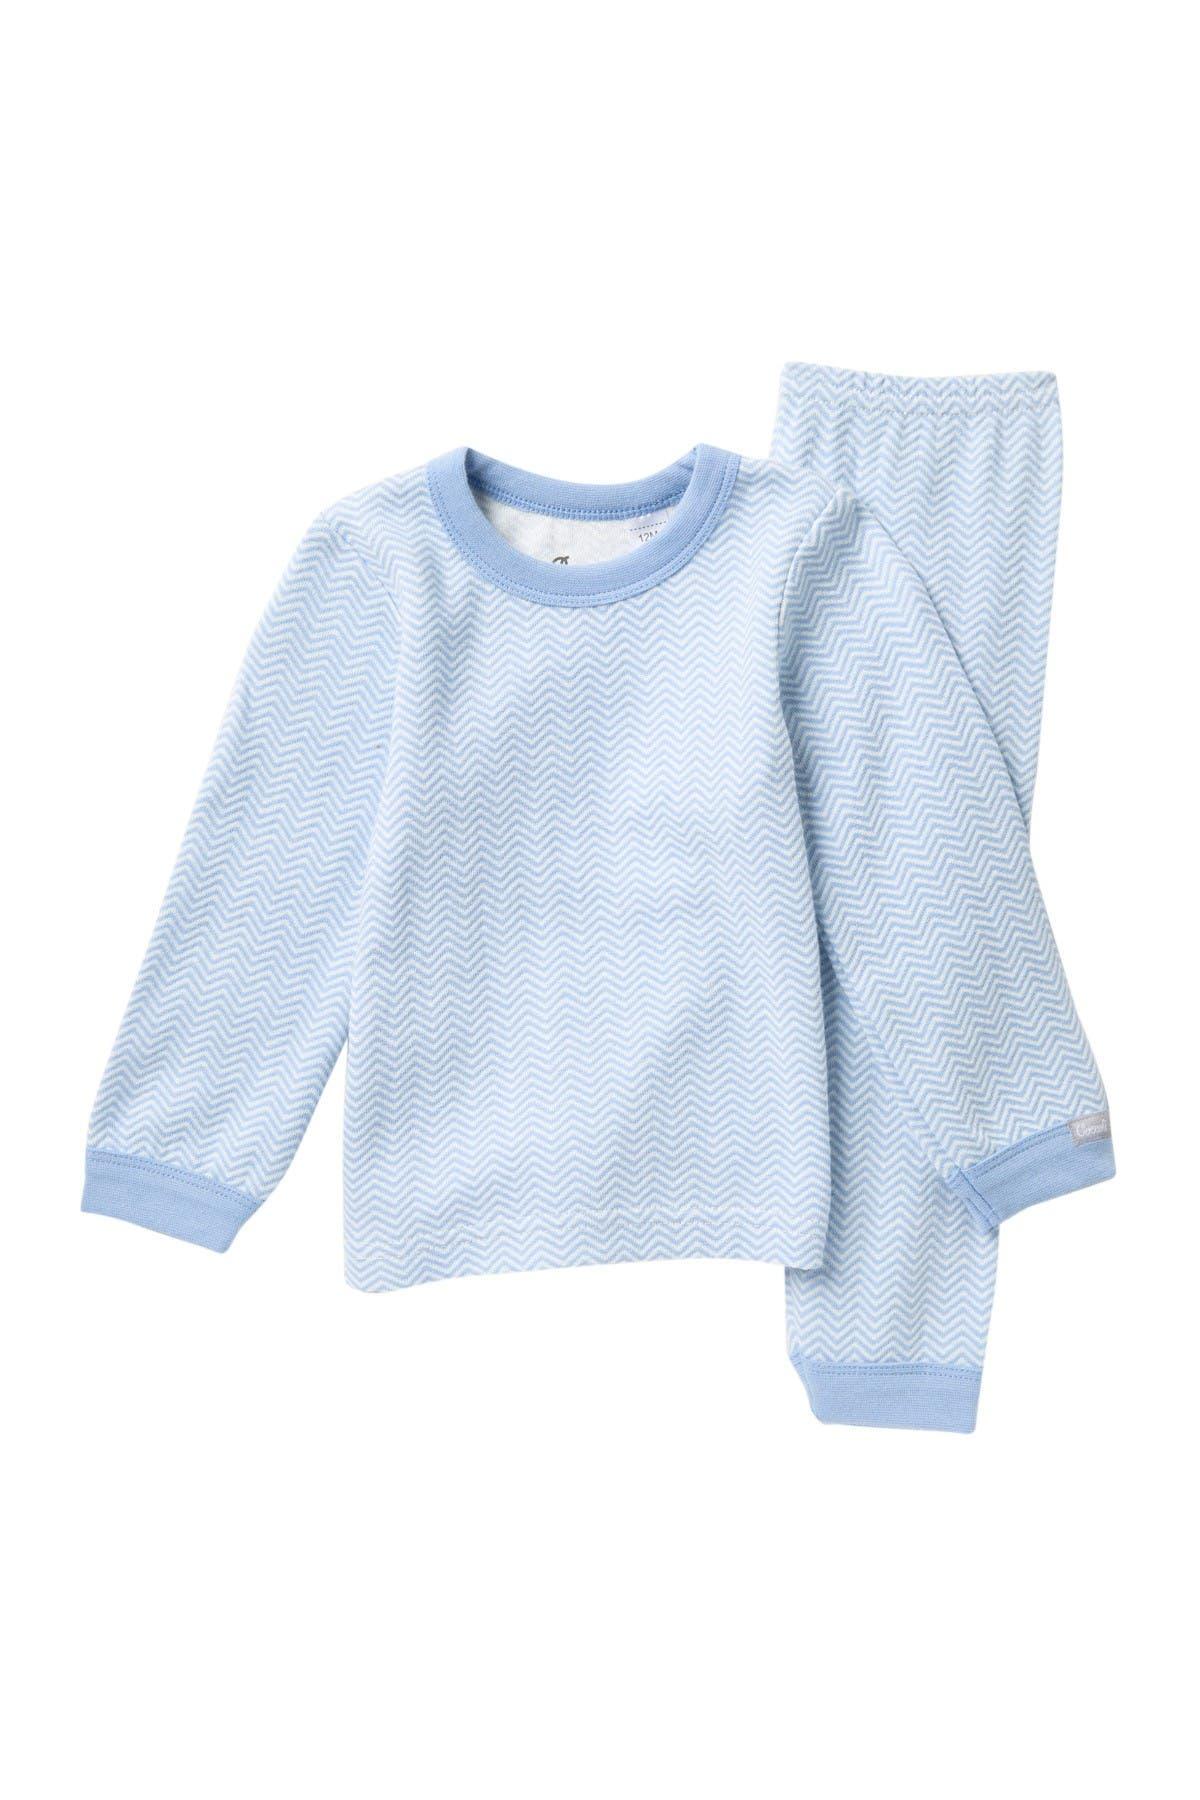 Image of Coccoli Cozy Pajama Set